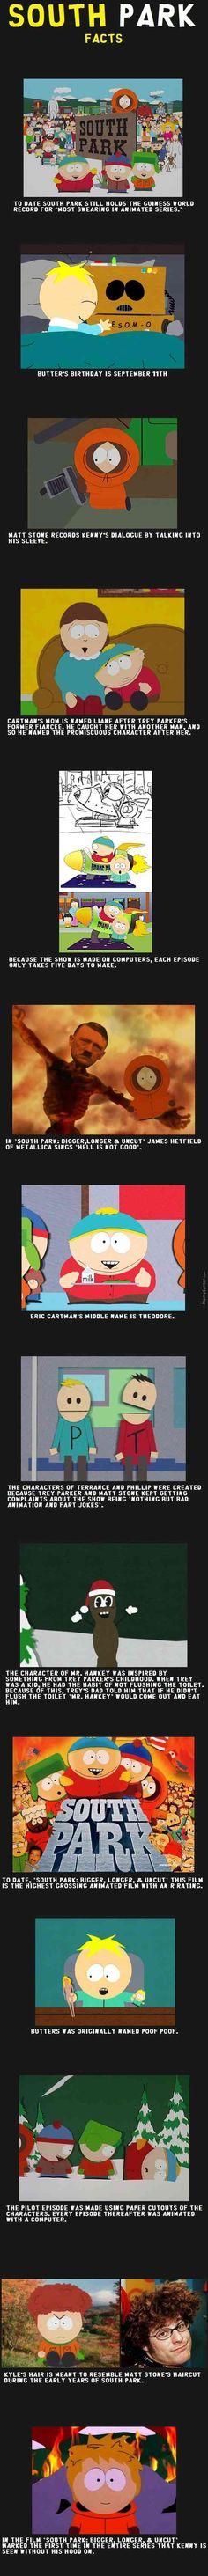 South Park Facts MadeItFunny. Funny, amusing website. Made to make you laugh.